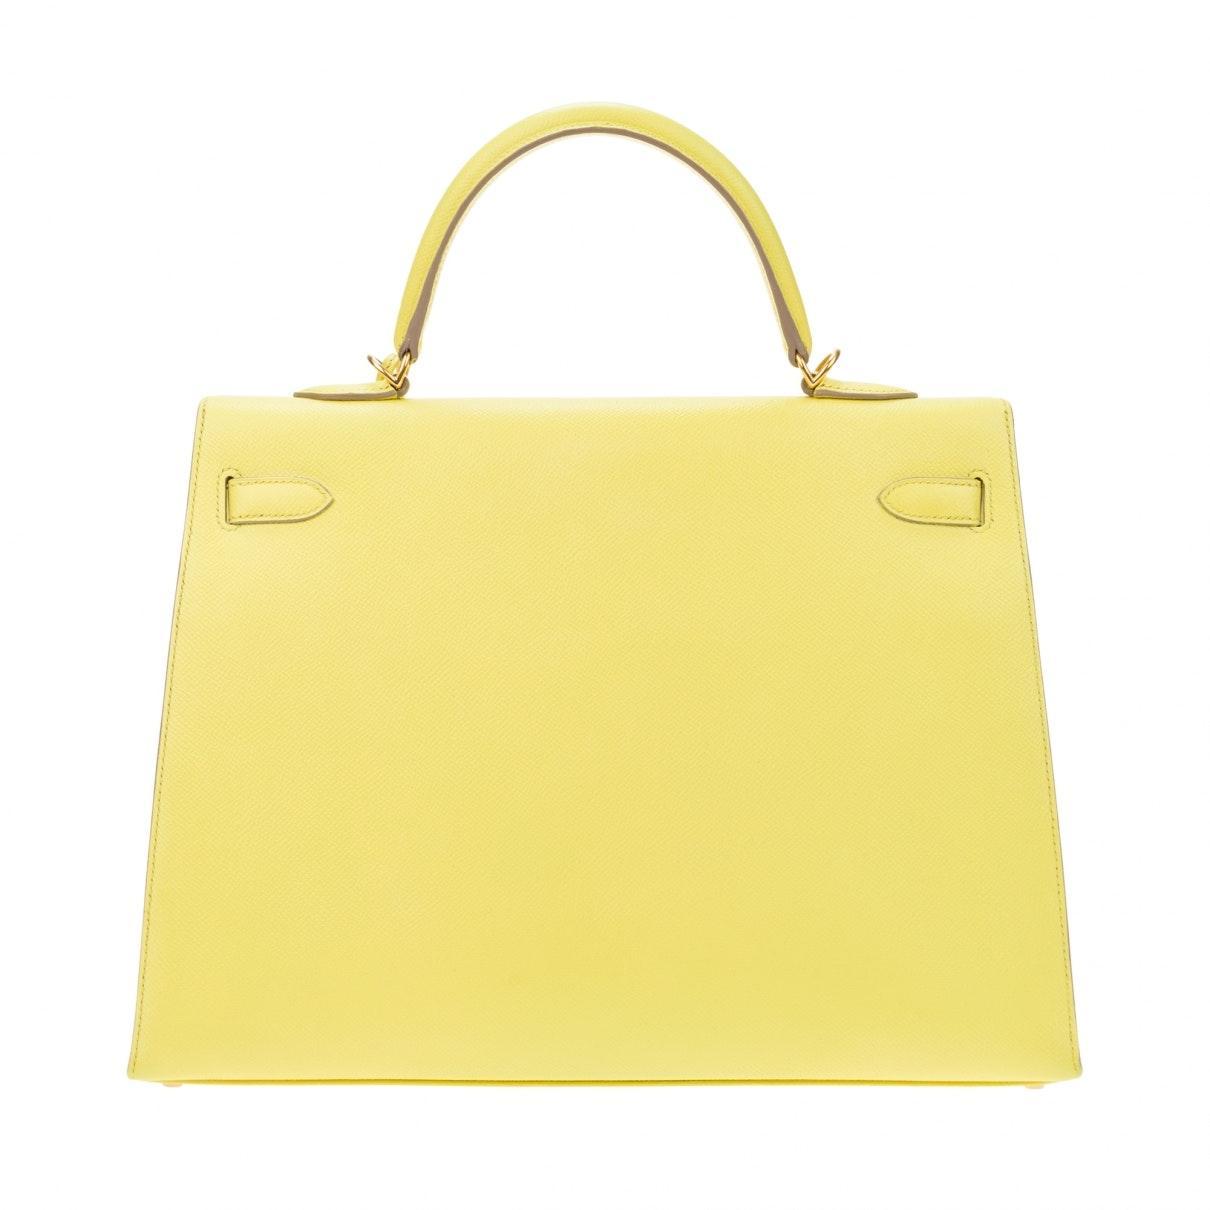 Sacs à main Kelly 35 Cuir Hermès en coloris Jaune 9Rot